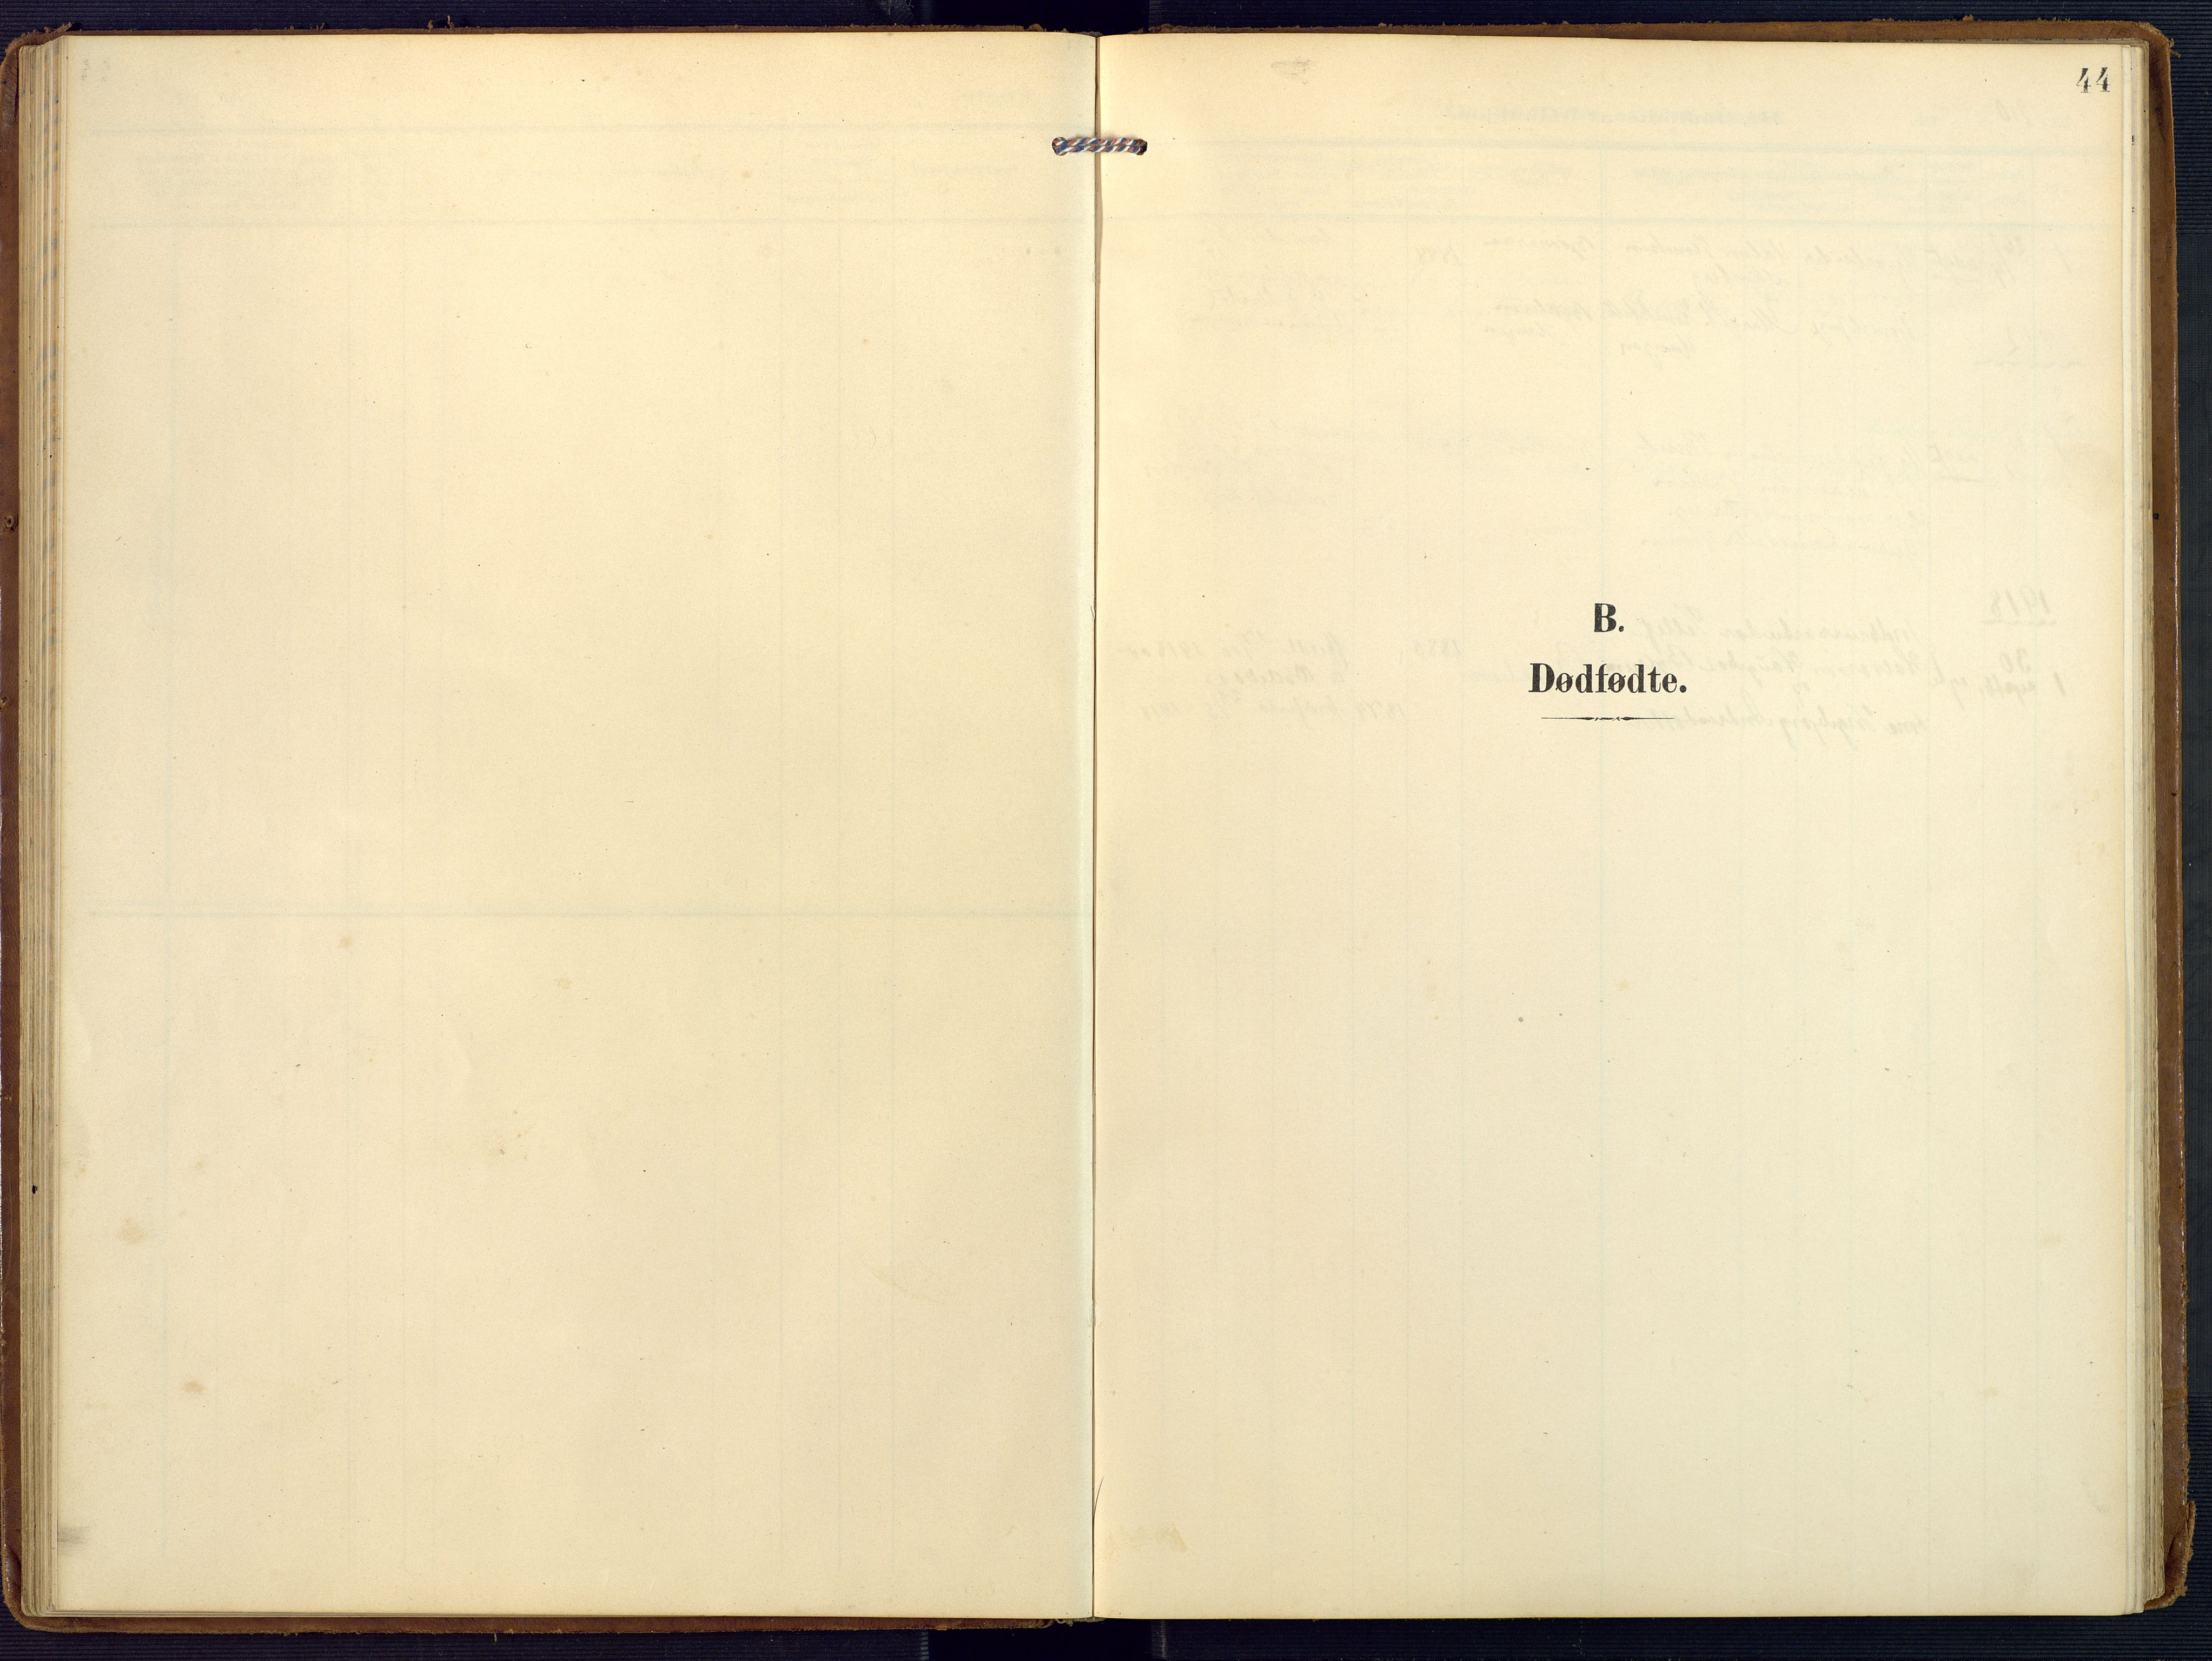 SAK, Valle sokneprestkontor, F/Fa/Faa/L0002: Ministerialbok nr. A 2, 1907-1919, s. 44